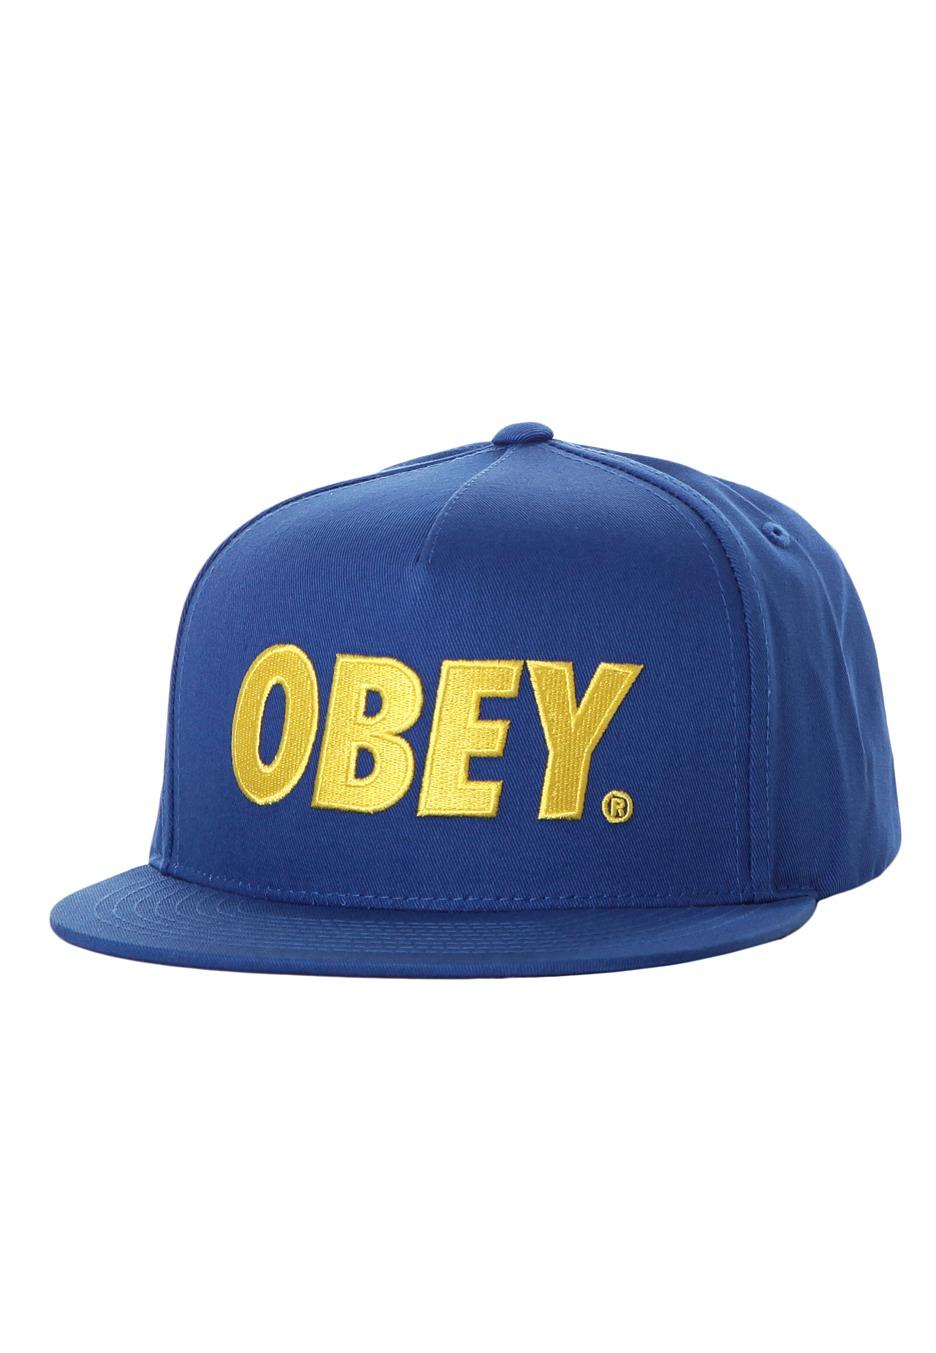 Obey - The City Blue Snapback - Cap - Streetwear Shop - Impericon.com  Worldwide 6529ed81f12